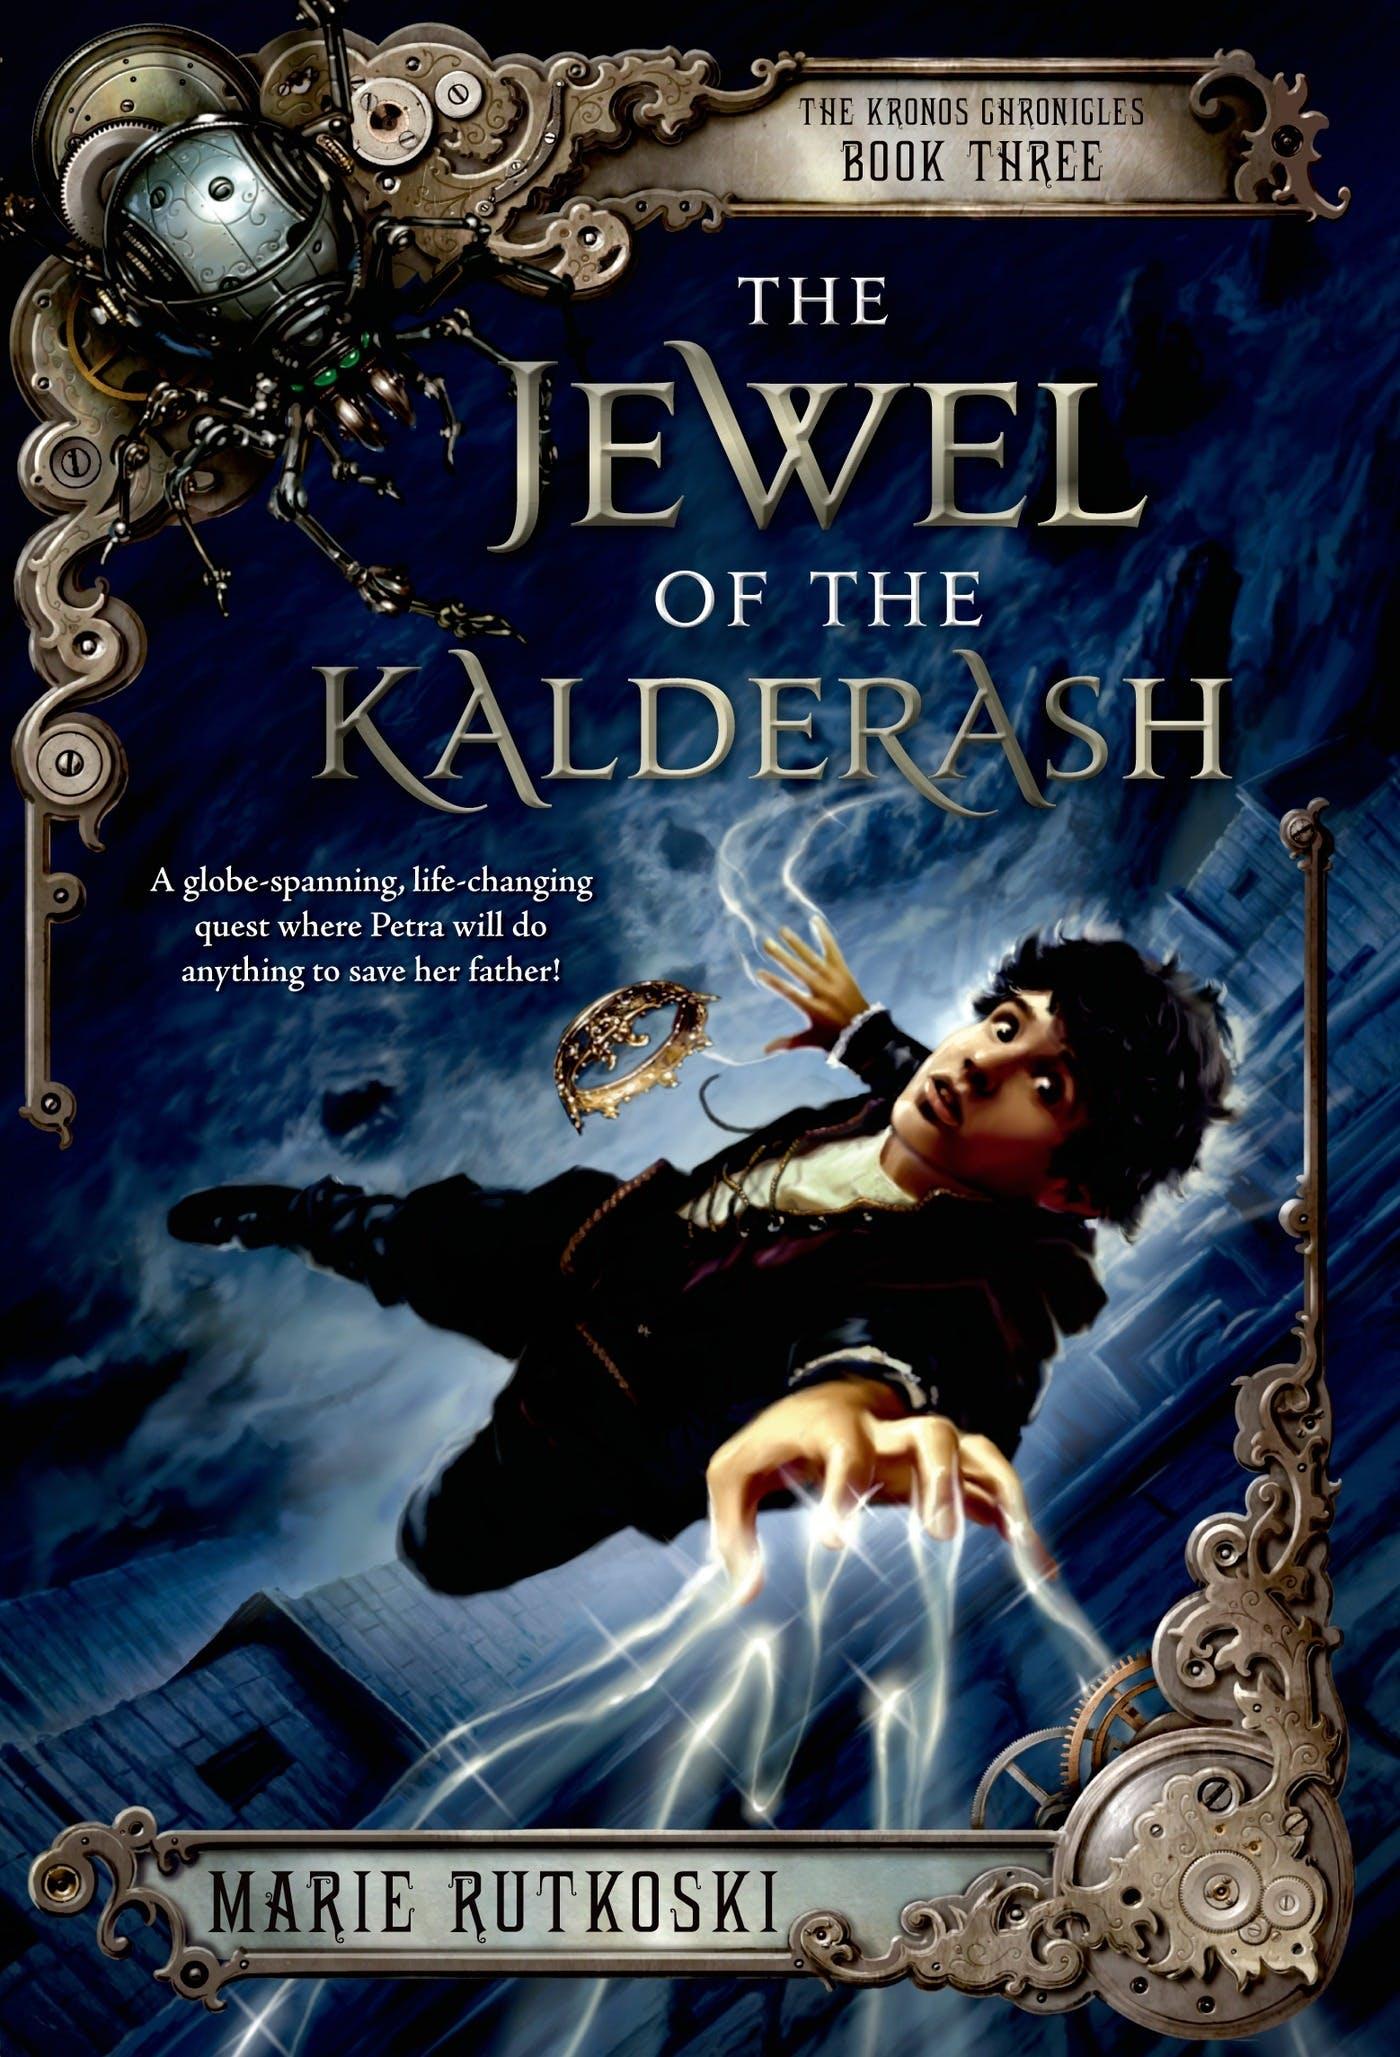 Image of The Jewel of the Kalderash